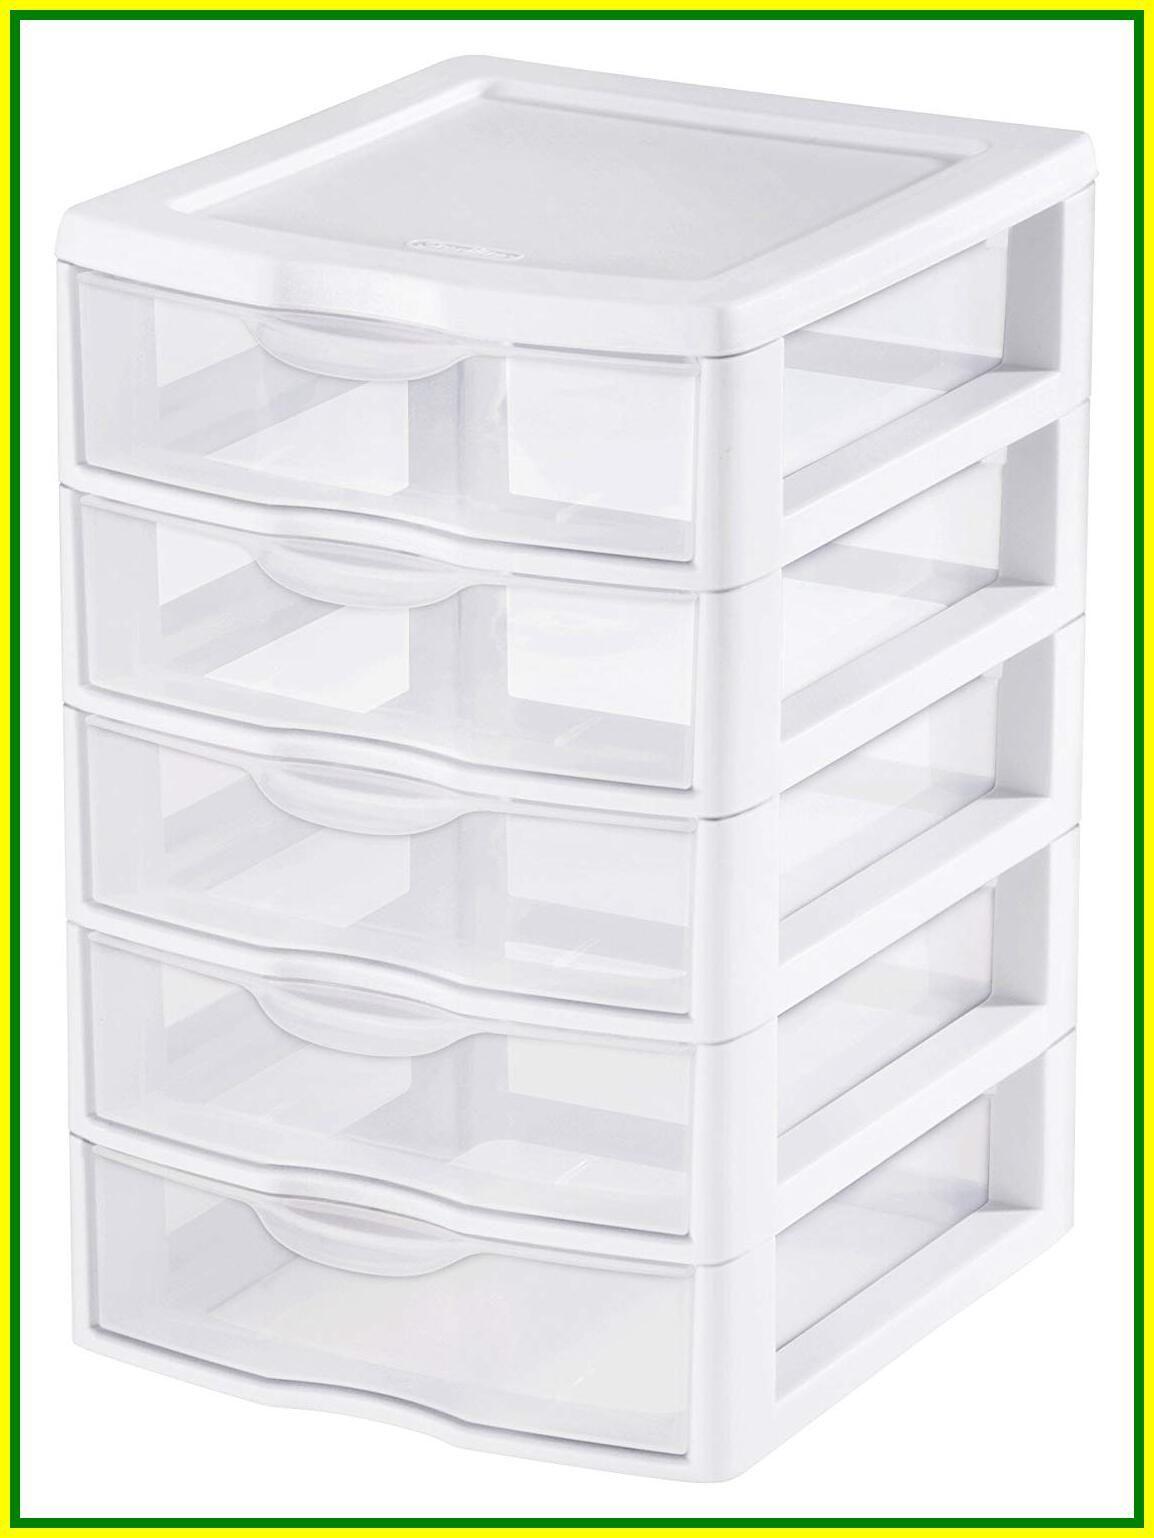 62 Reference Of Plastic Drawer Organizer Target In 2020 Desktop Storage Drawers Plastic Storage Cabinets Desktop Drawers